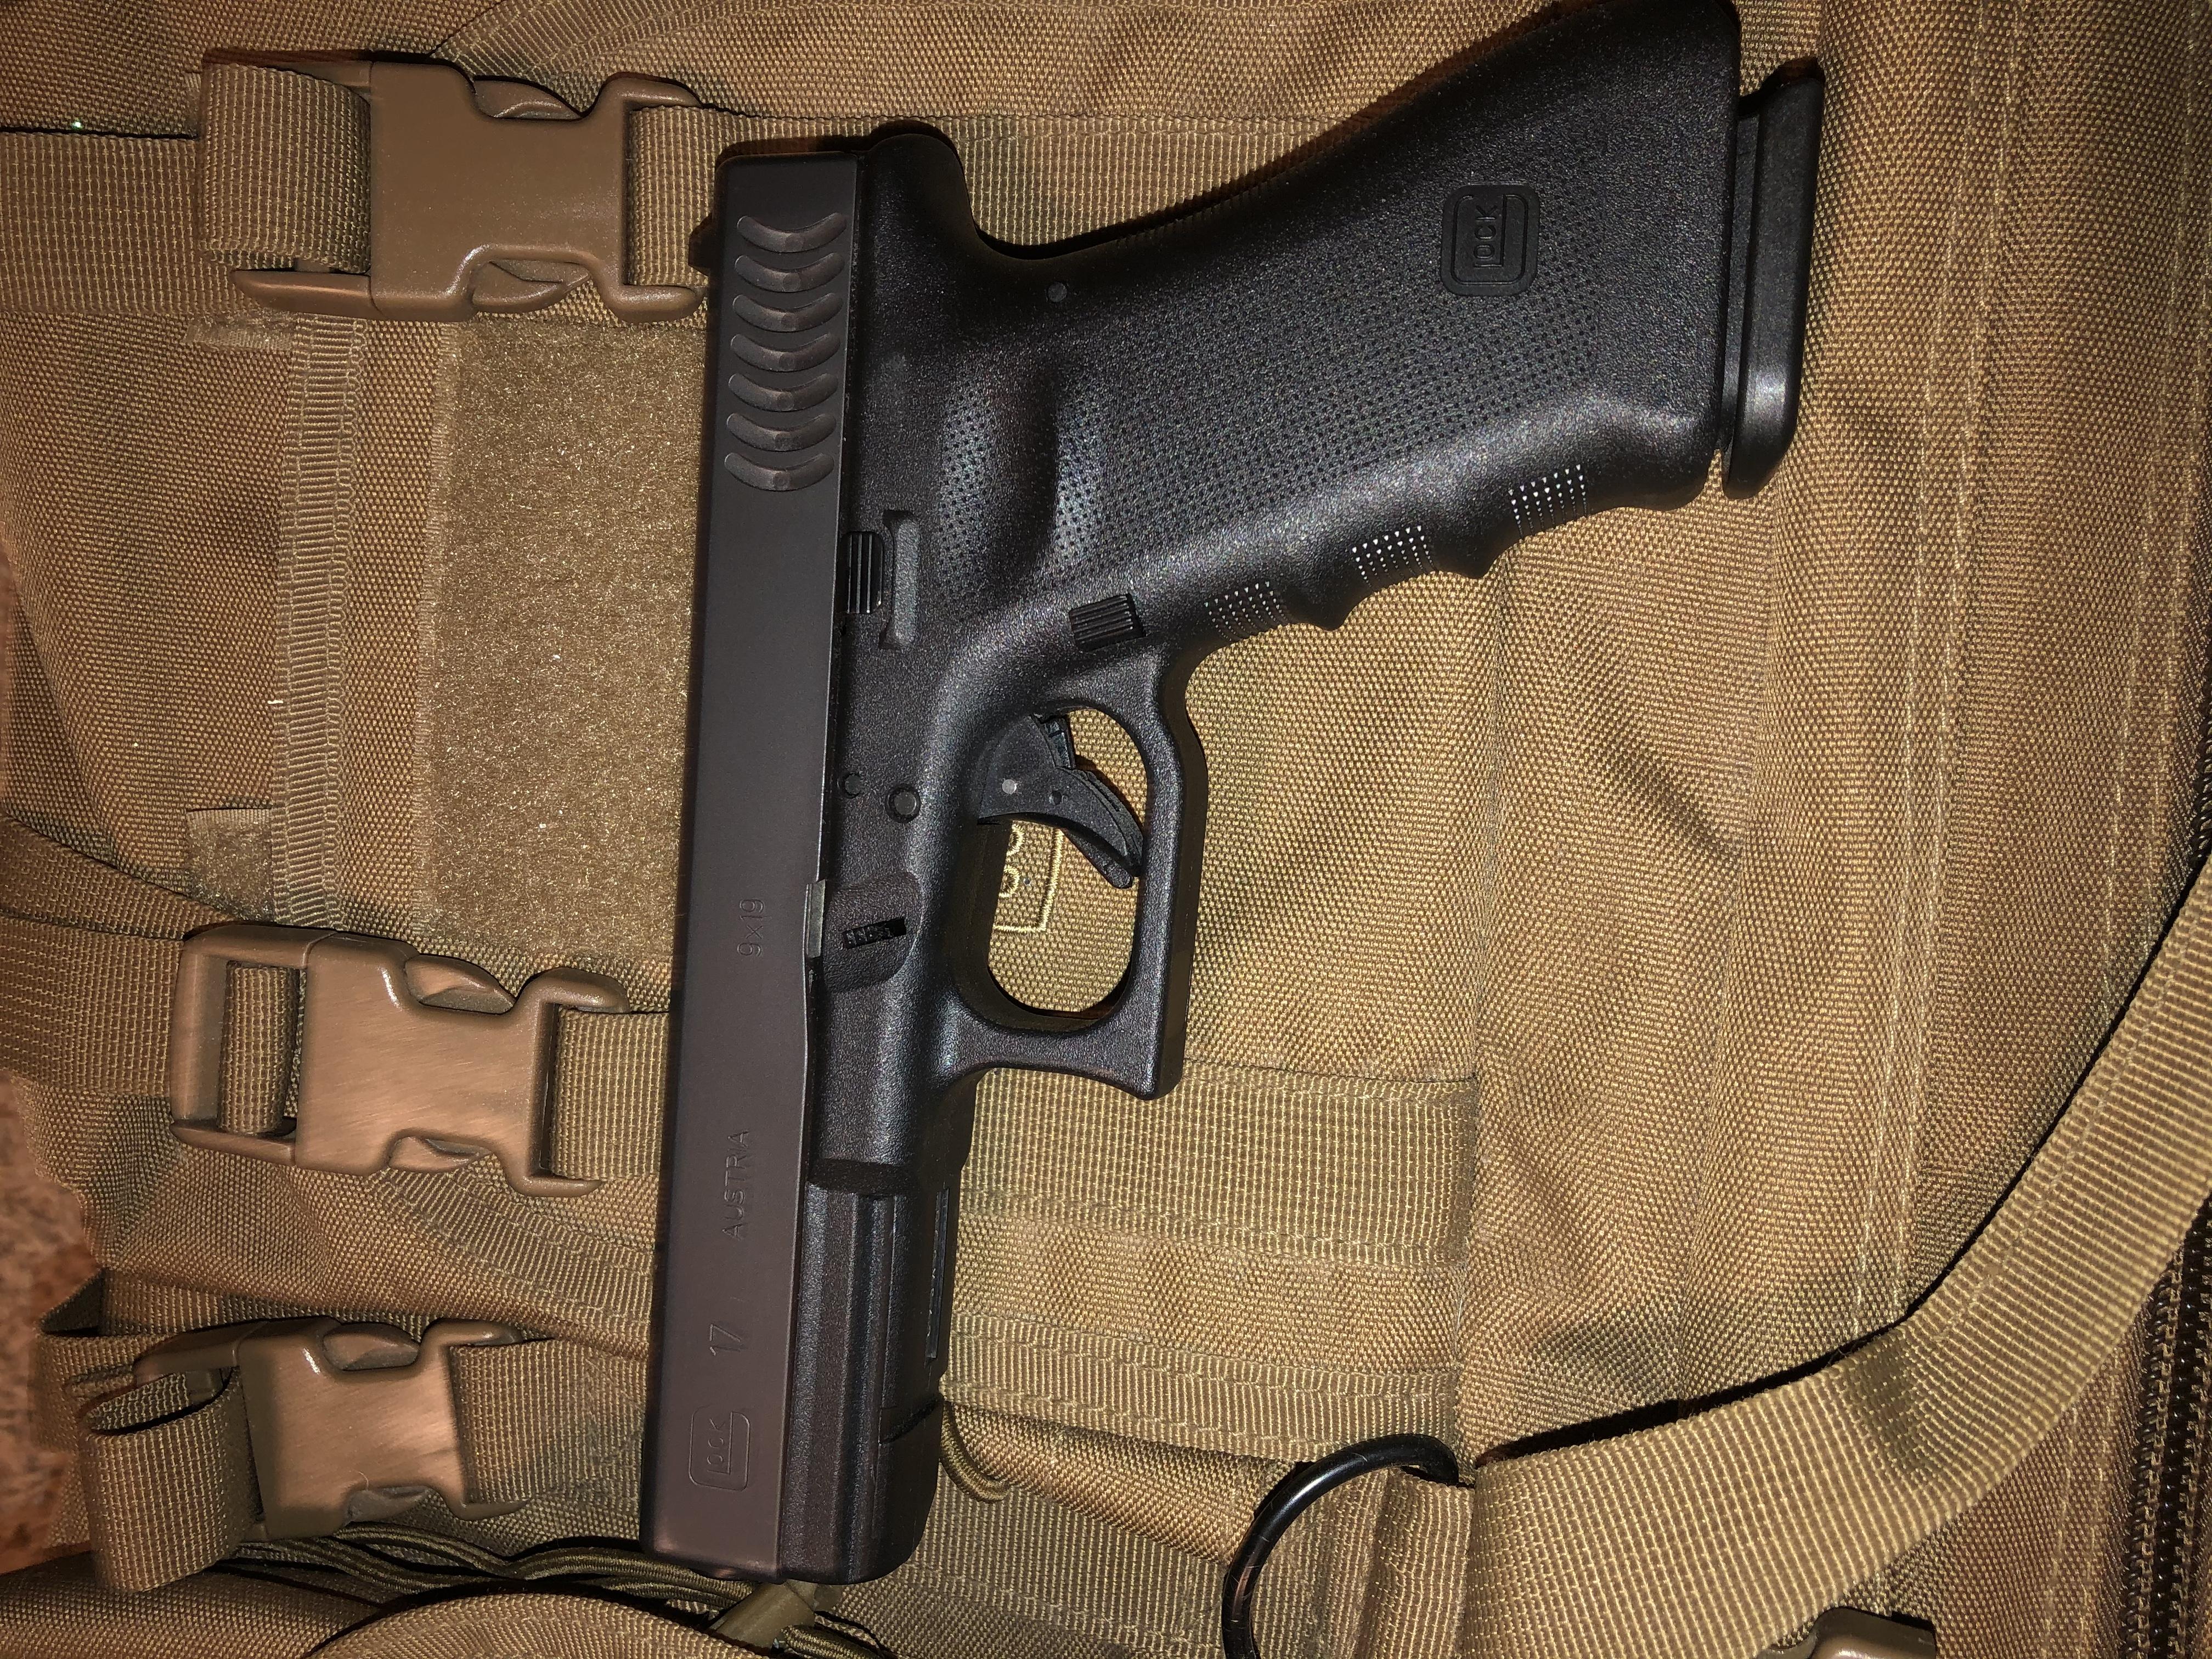 Glock 17 RTF w/ Fish Gills-8261ba7b-2621-4329-8316-9b28a72eb0f8.jpeg